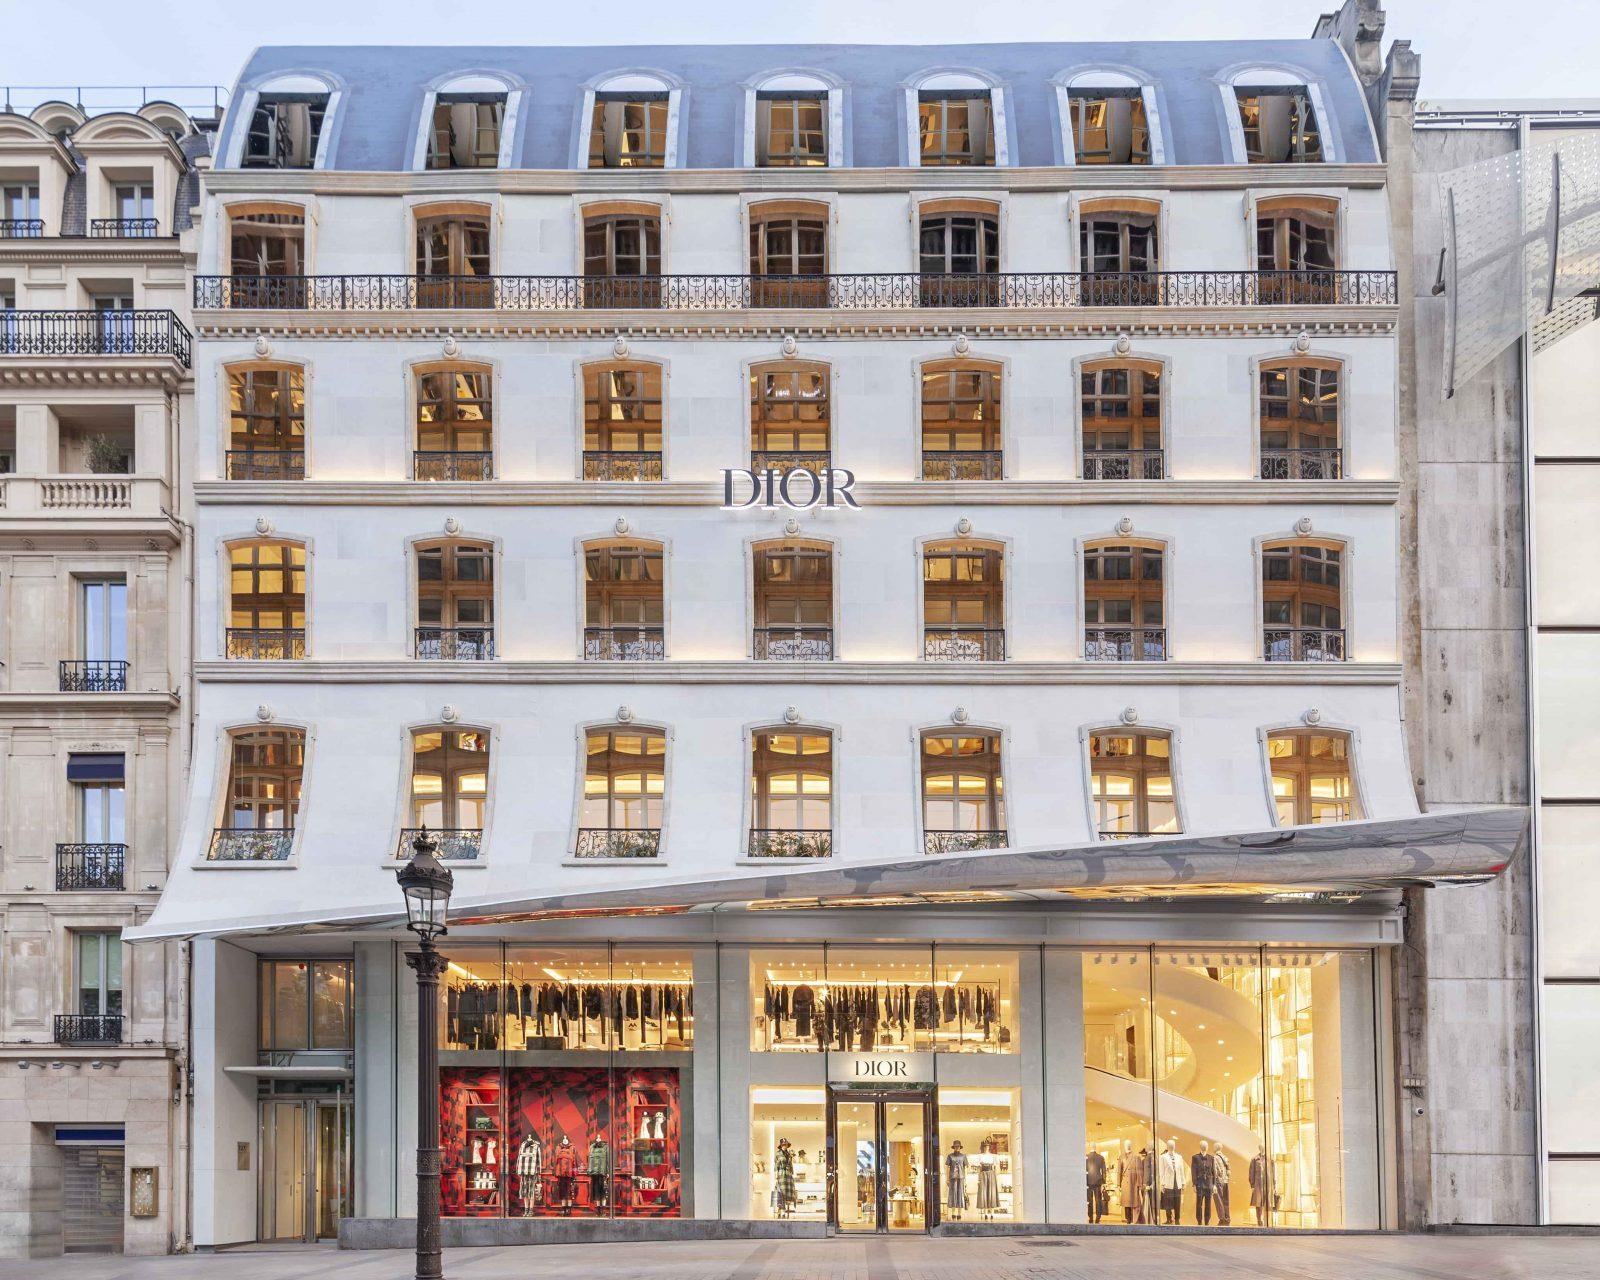 dior-champs-elysees-fachada-foto-cortesia-dior